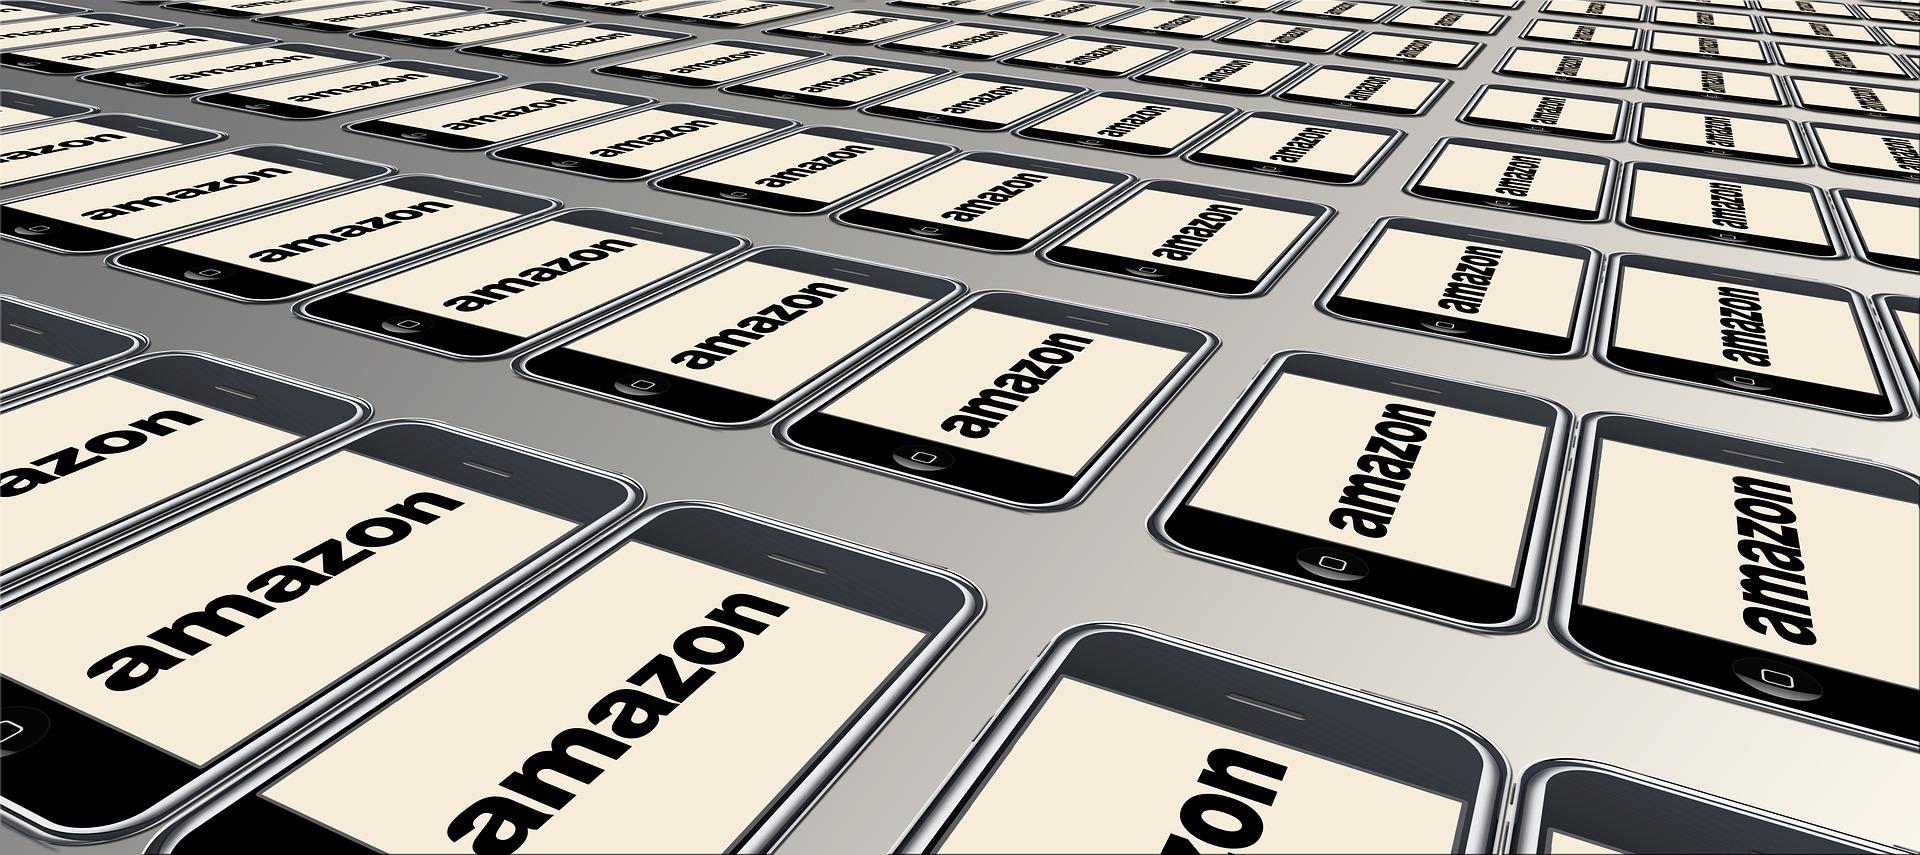 Amazon: História de Sucesso